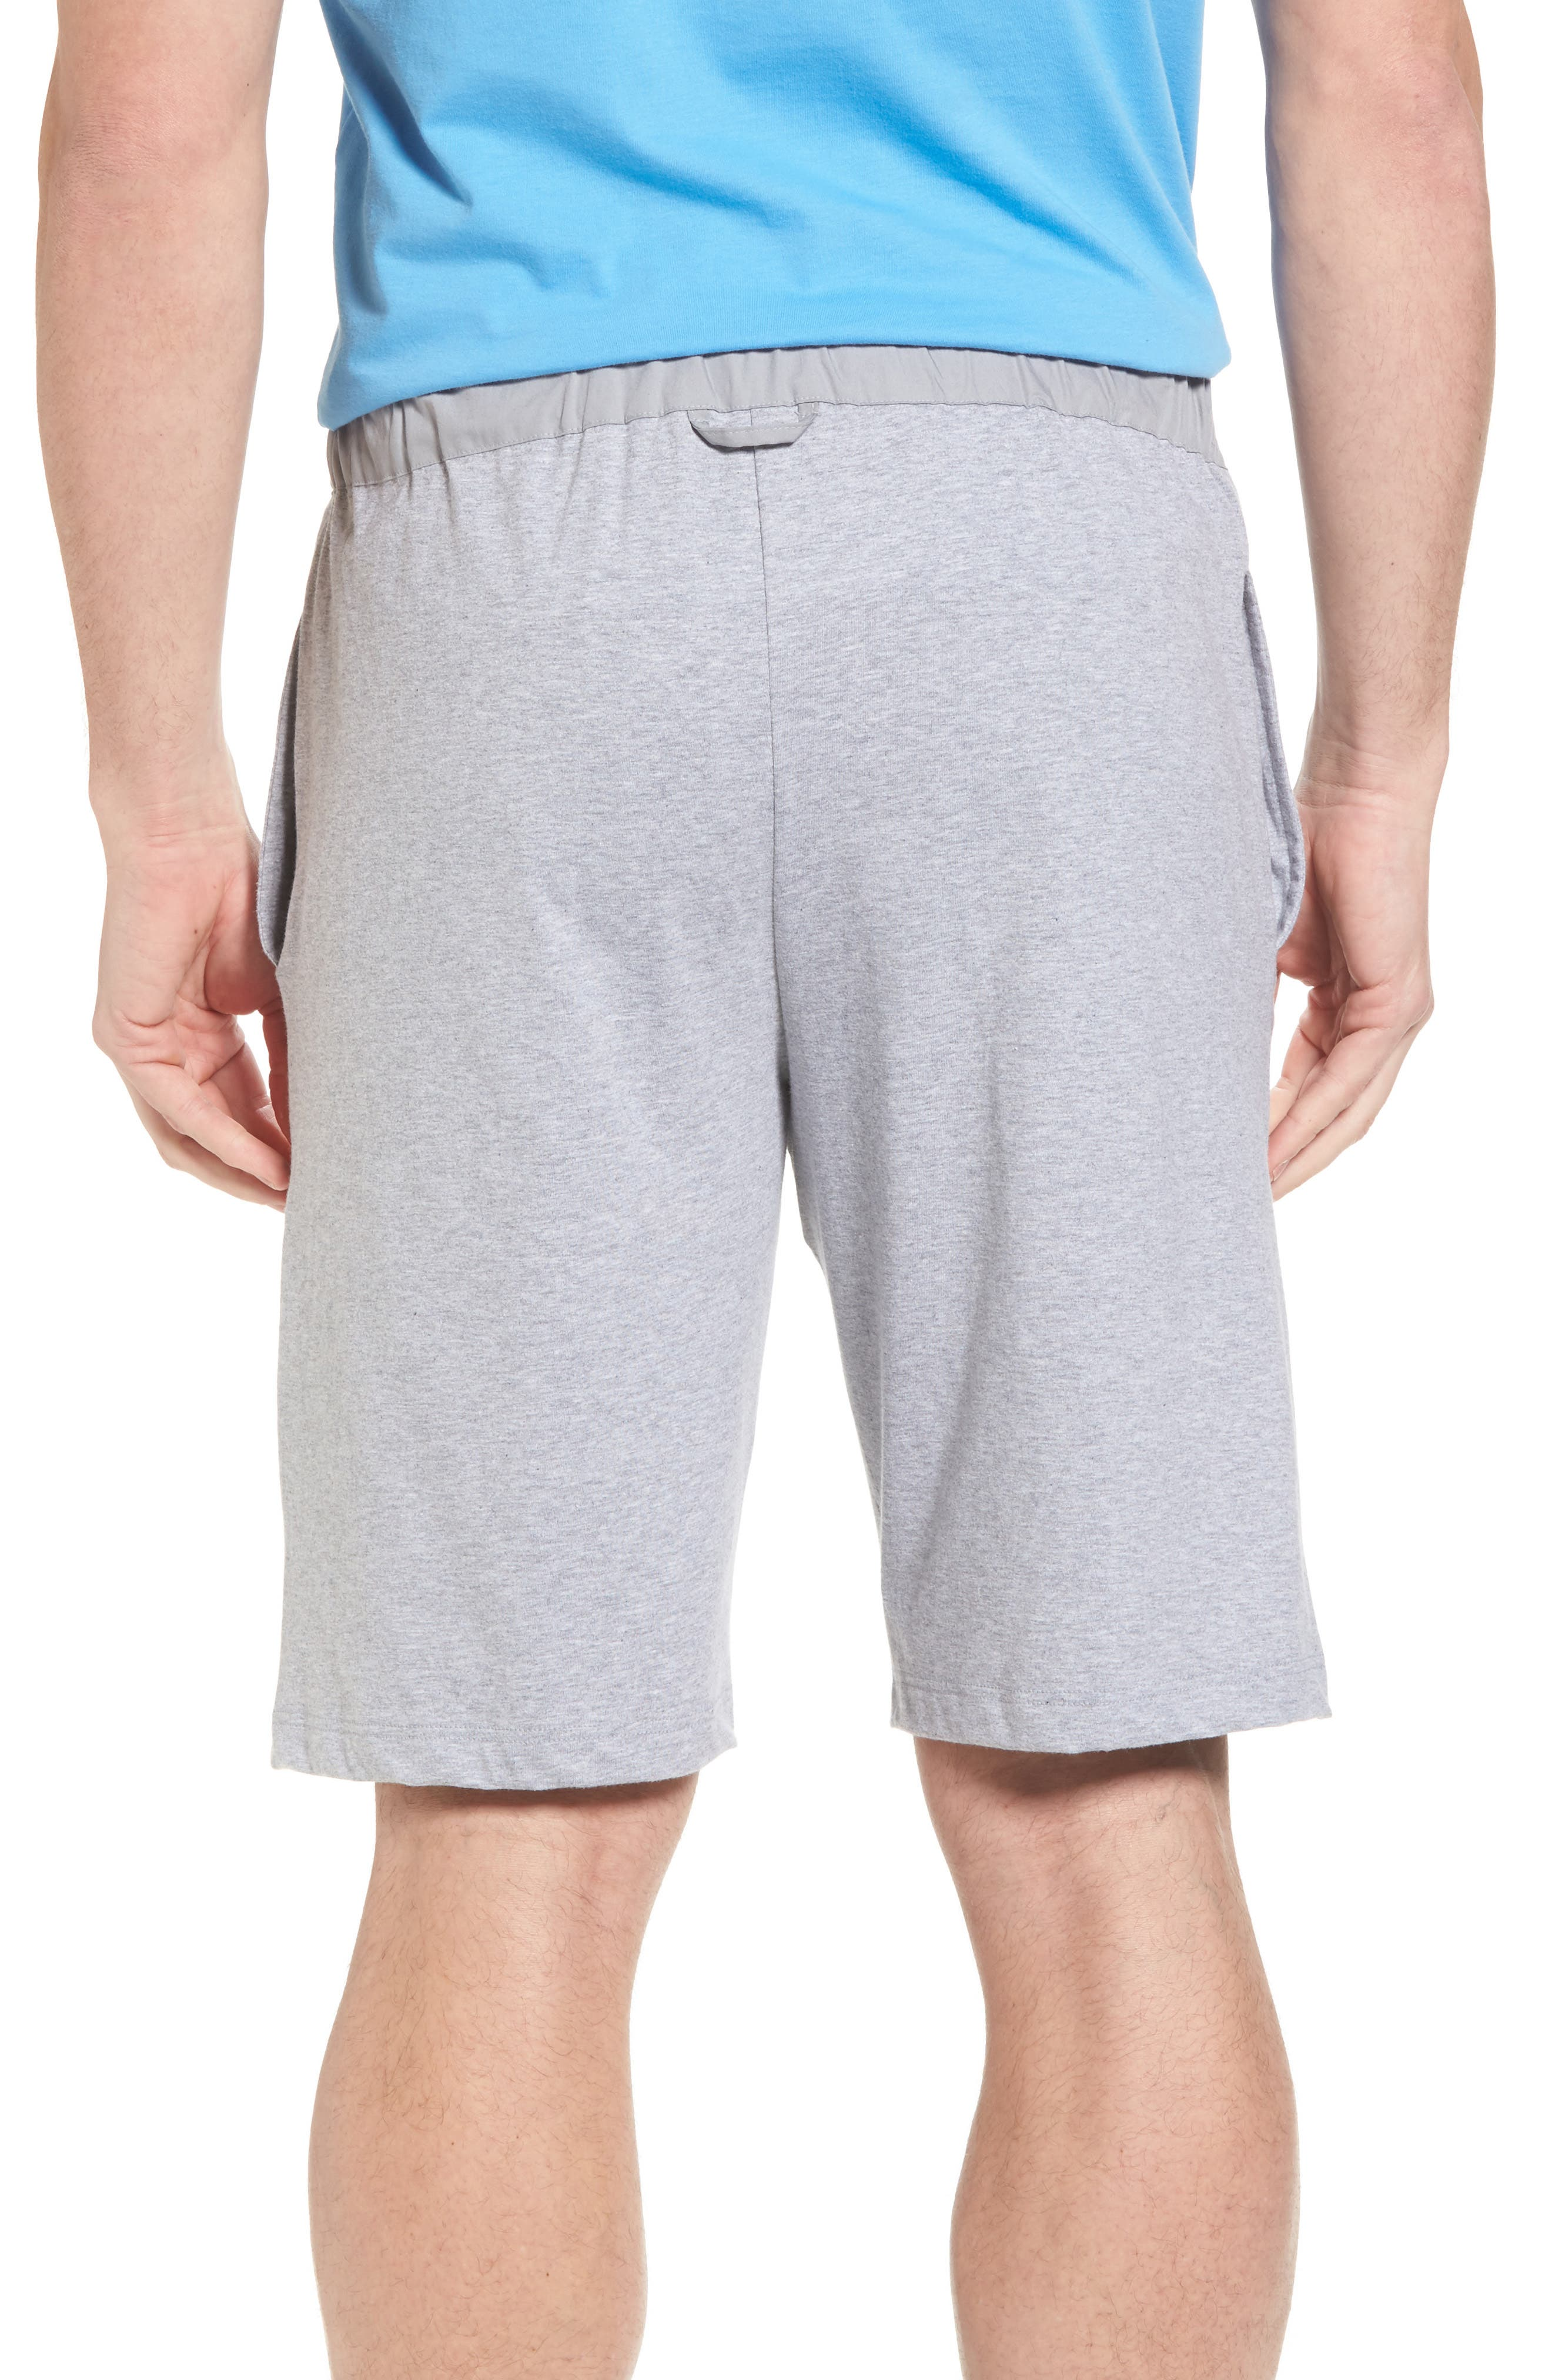 Night & Day Knit Shorts,                             Alternate thumbnail 2, color,                             Silver Melange